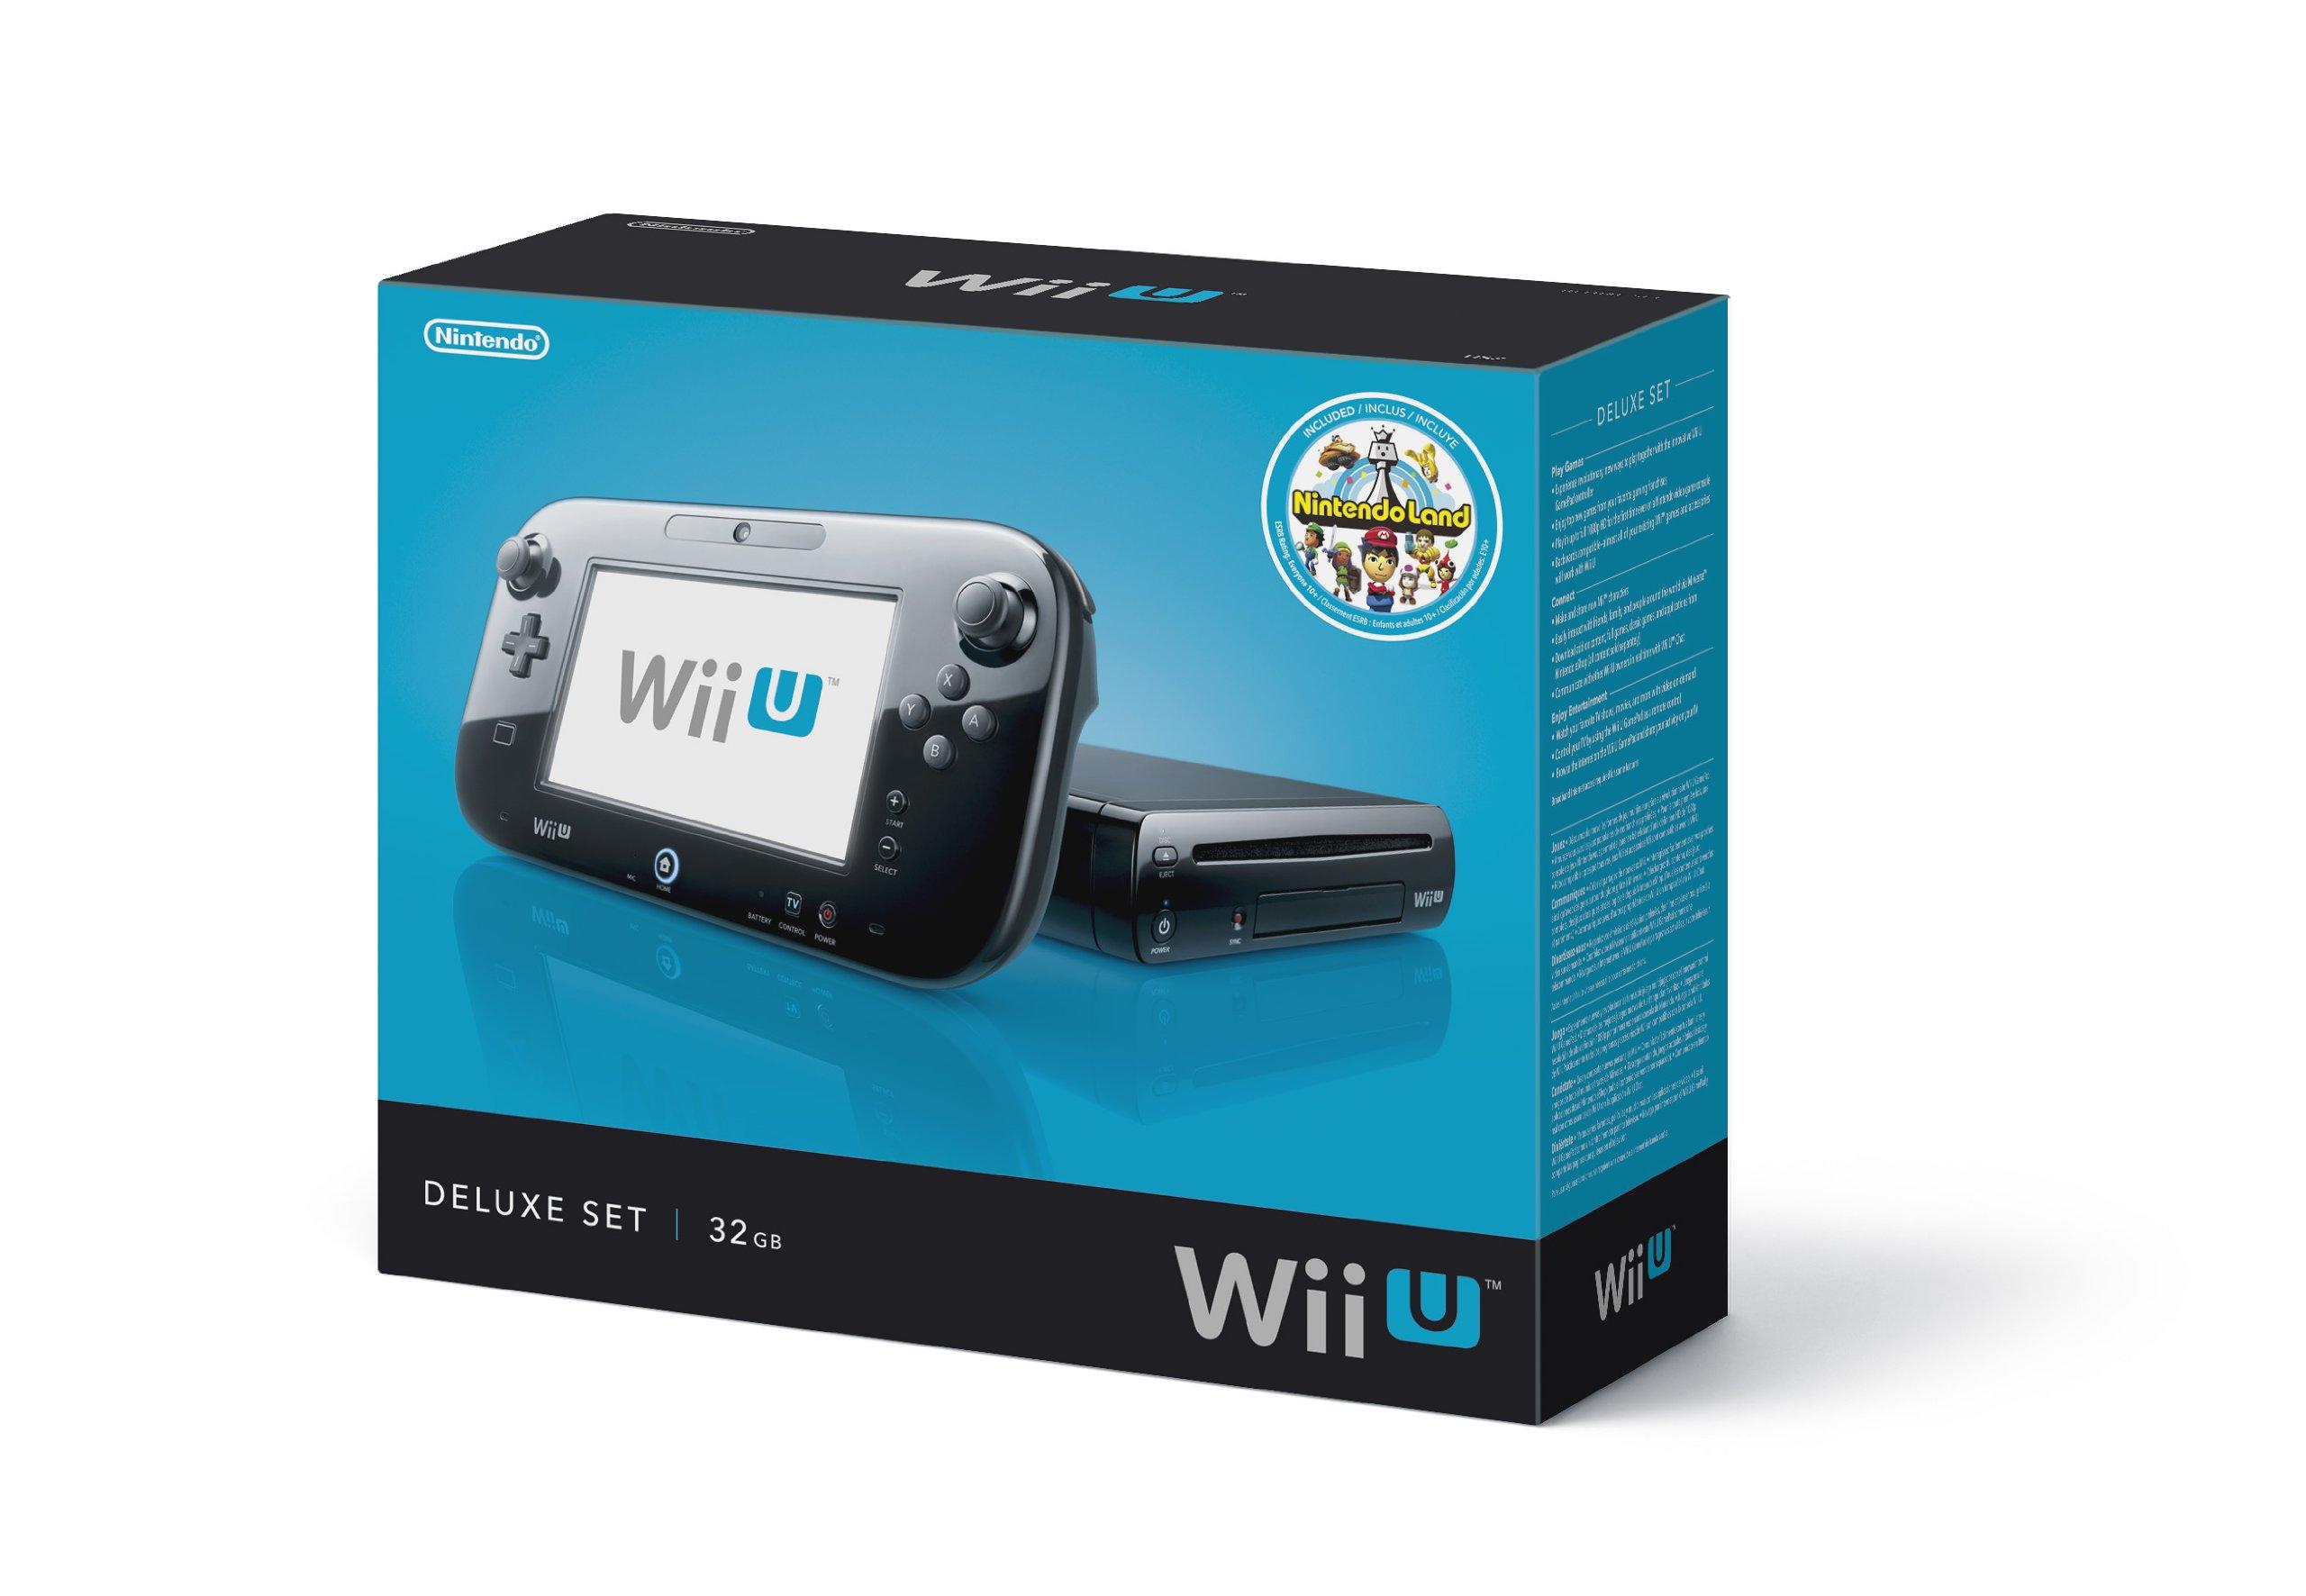 Nintendo Wii U Console - 32GB Black Deluxe Set | eBay